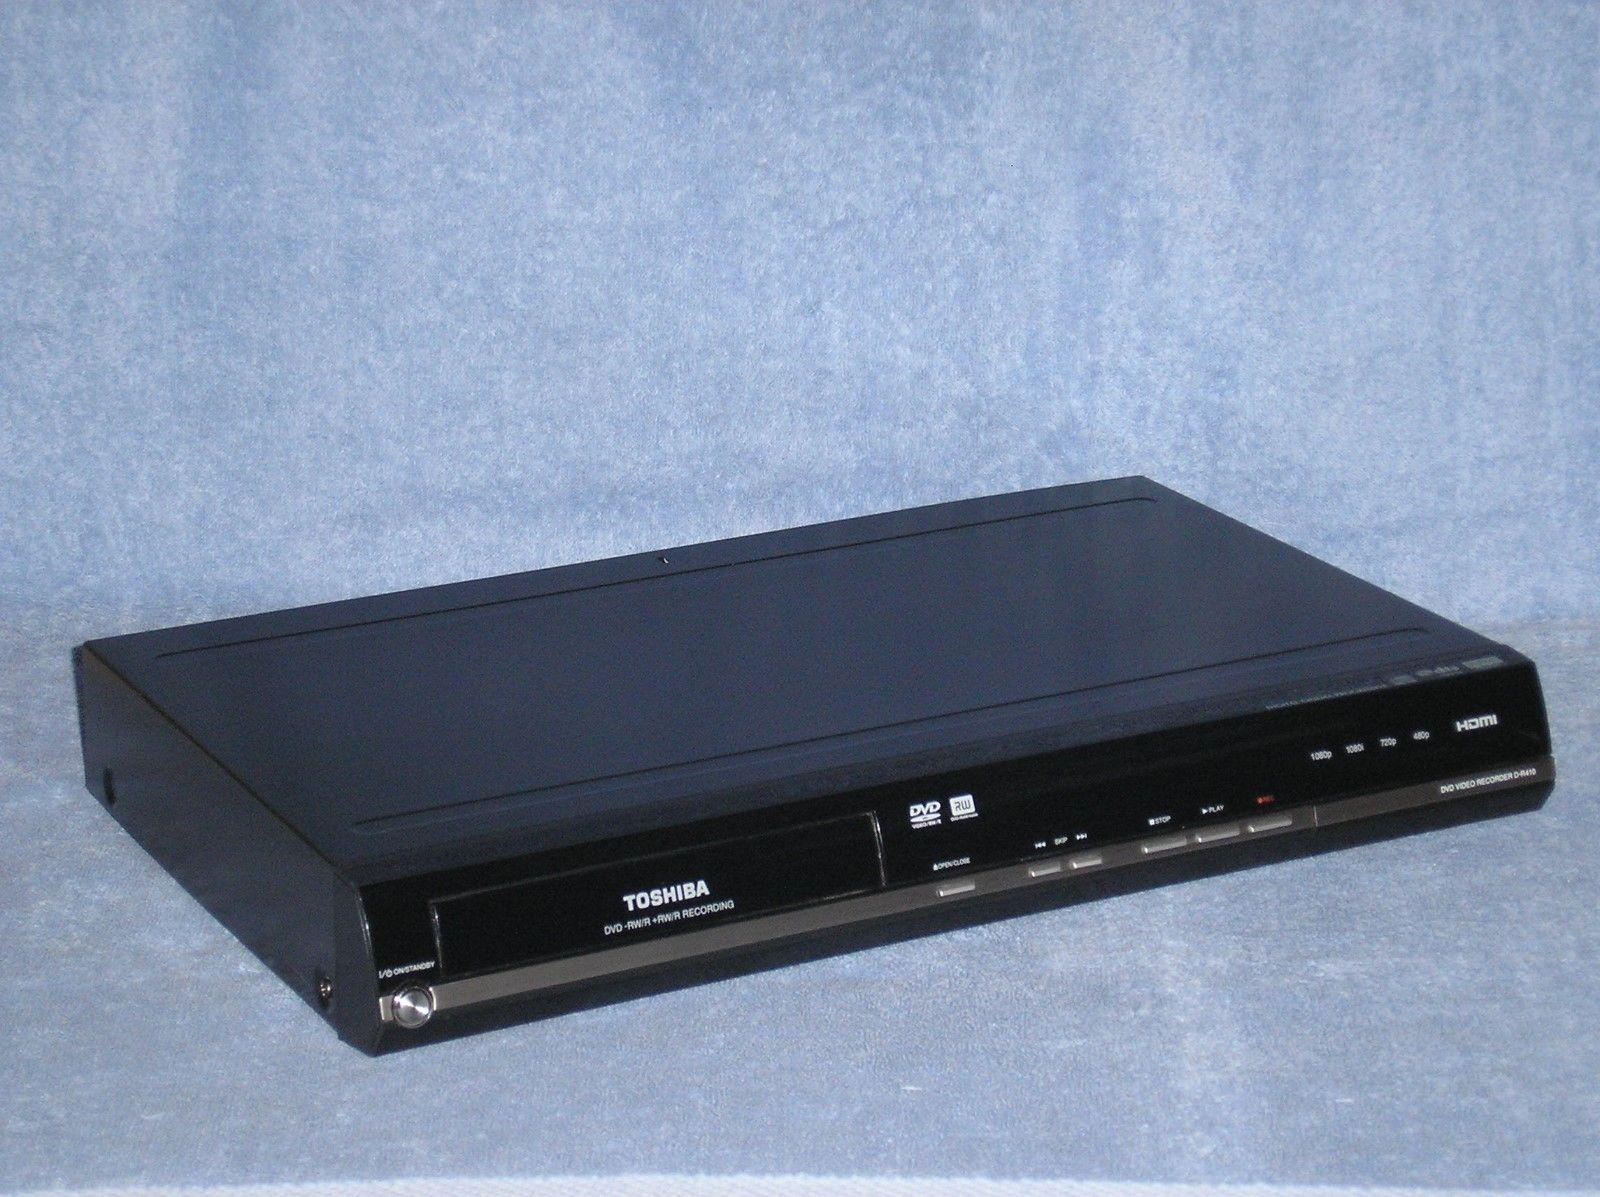 toshiba d r410 dvd cd player recorder pdf manual common rh pinterest com toshiba dvd recorder manual download toshiba dvd recorder manual download